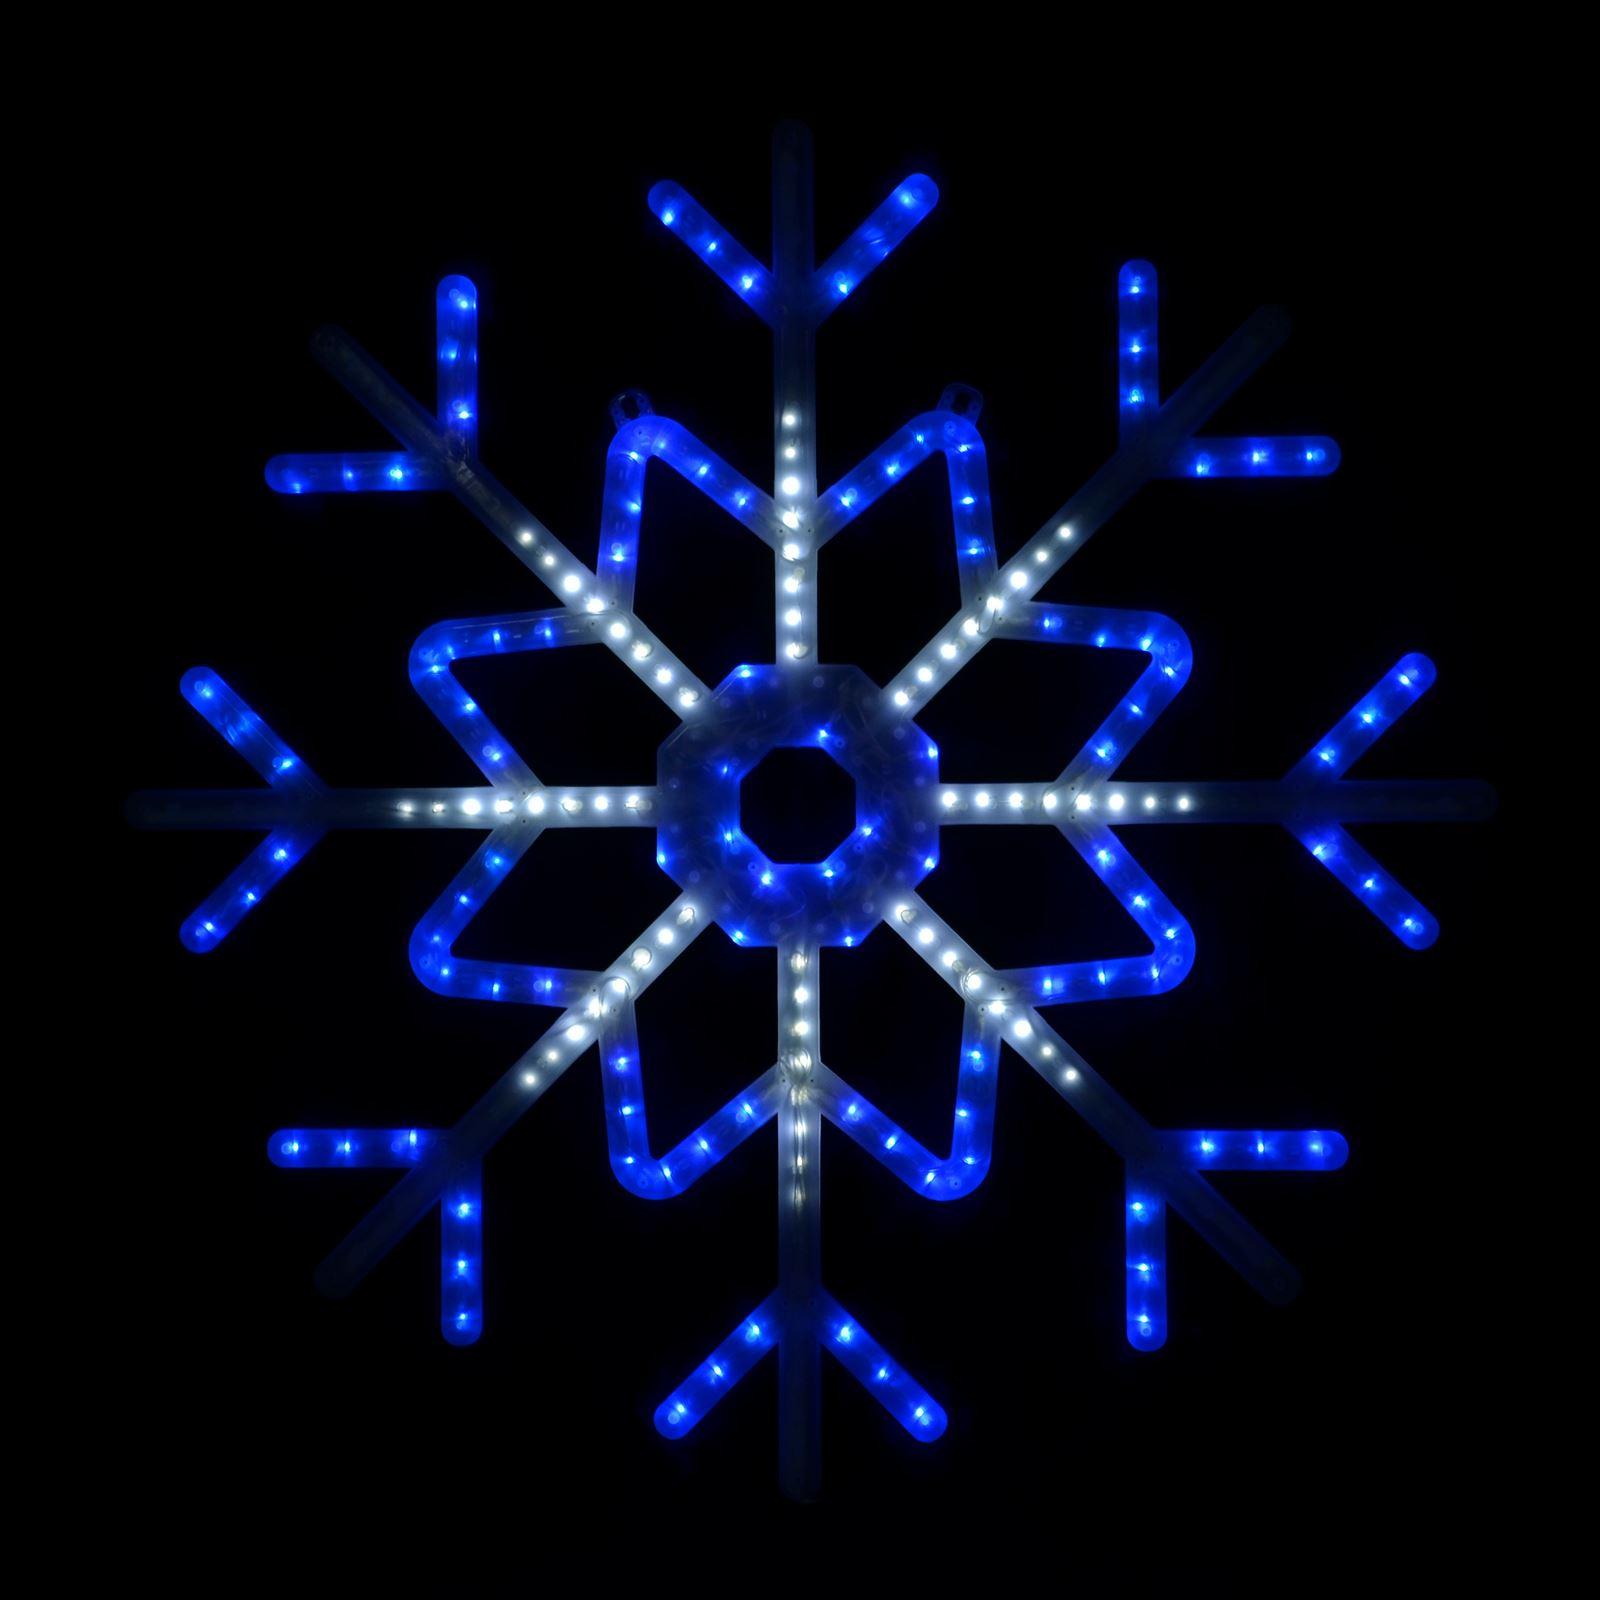 Blue/White LED Flashing Snowflake Outdoor Christmas Light ...